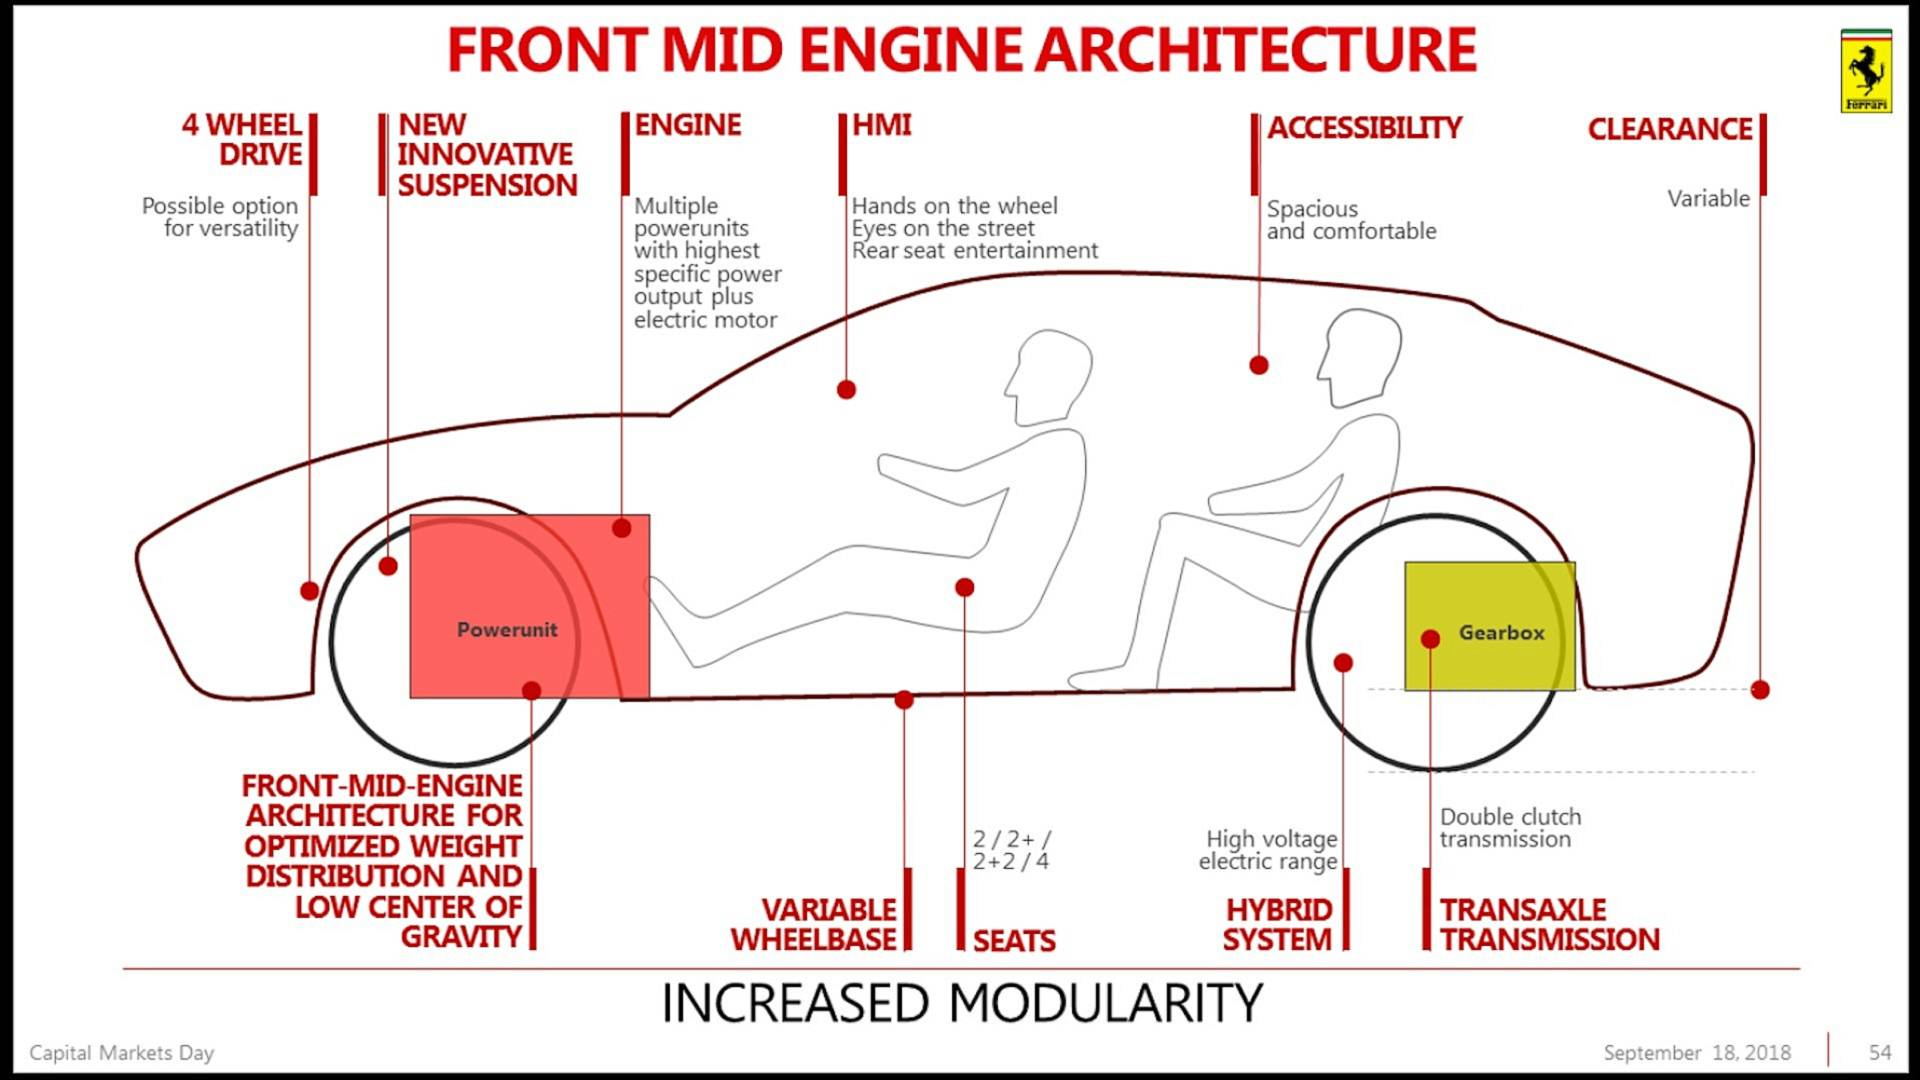 Piano Industriale Ferrari 2018-2022 (45)